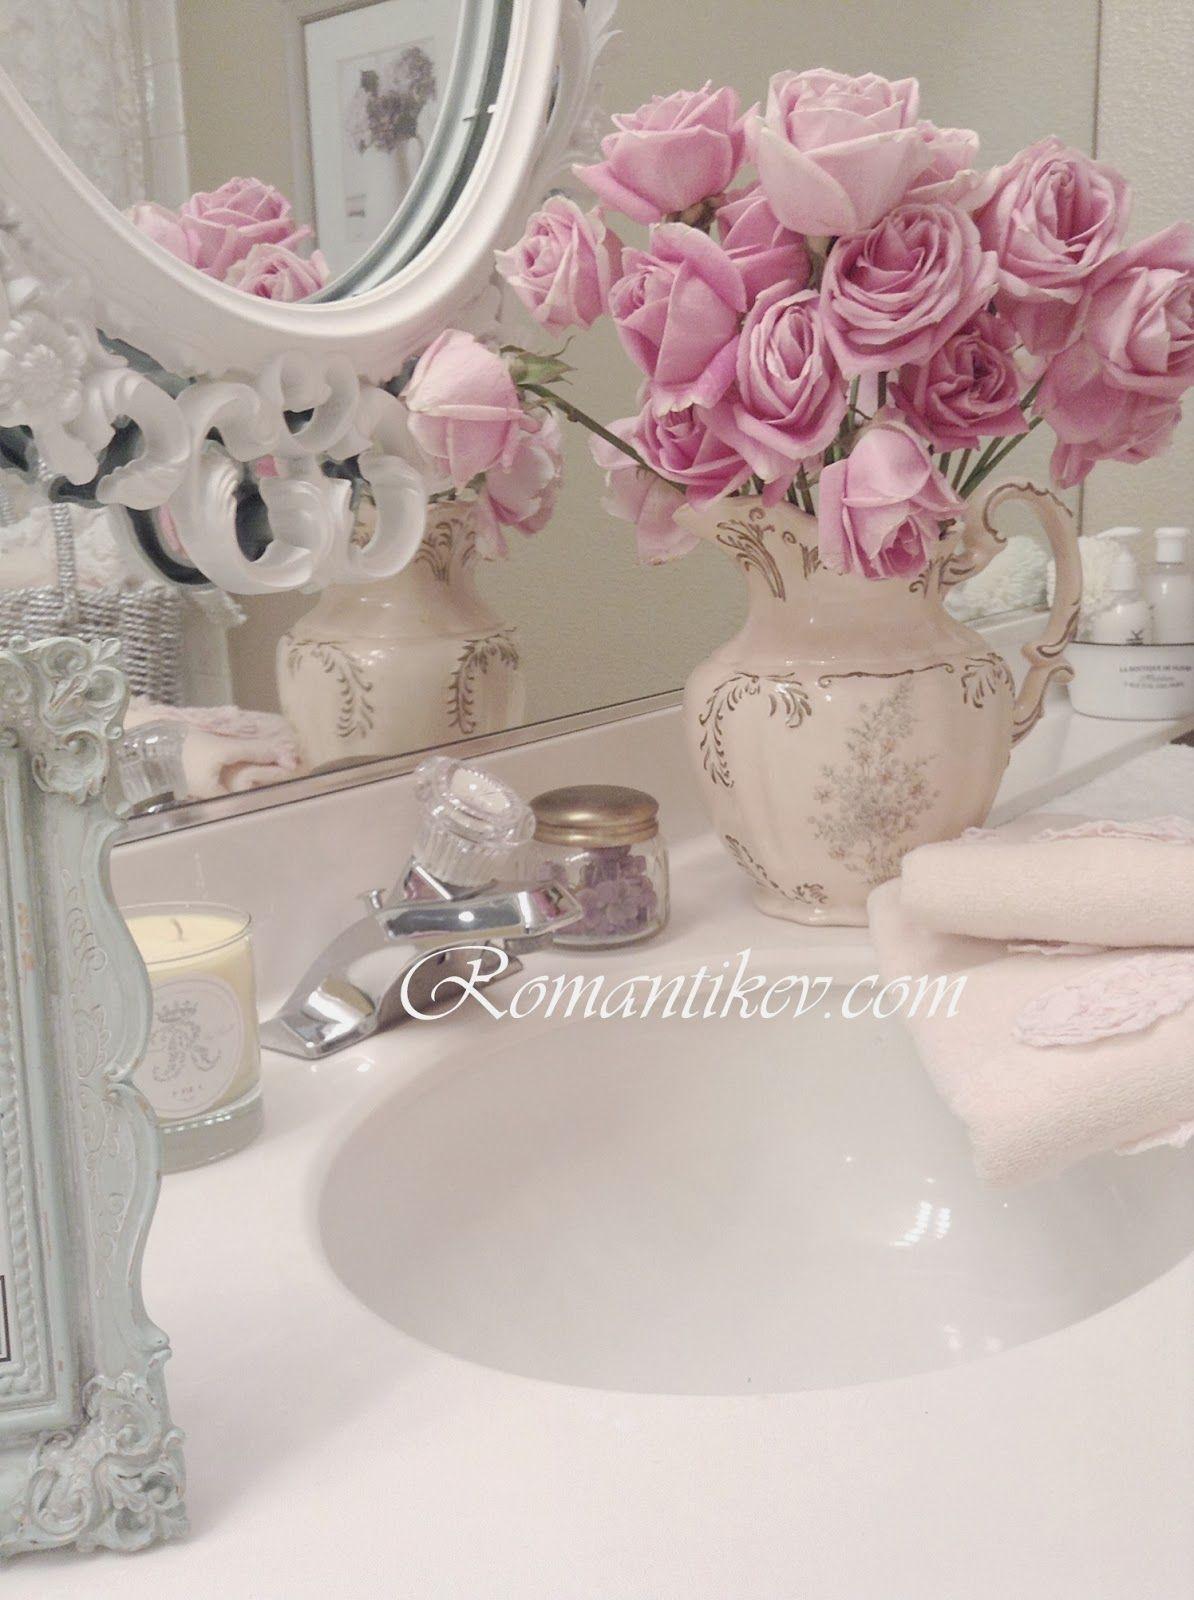 Romantic shabby chic home romantic shabby chic blog - My Shabby Chic Home Romantik Evim Romantik Ev Romantik Ev My Bathroom Shabby Chic Pembe Beyaz